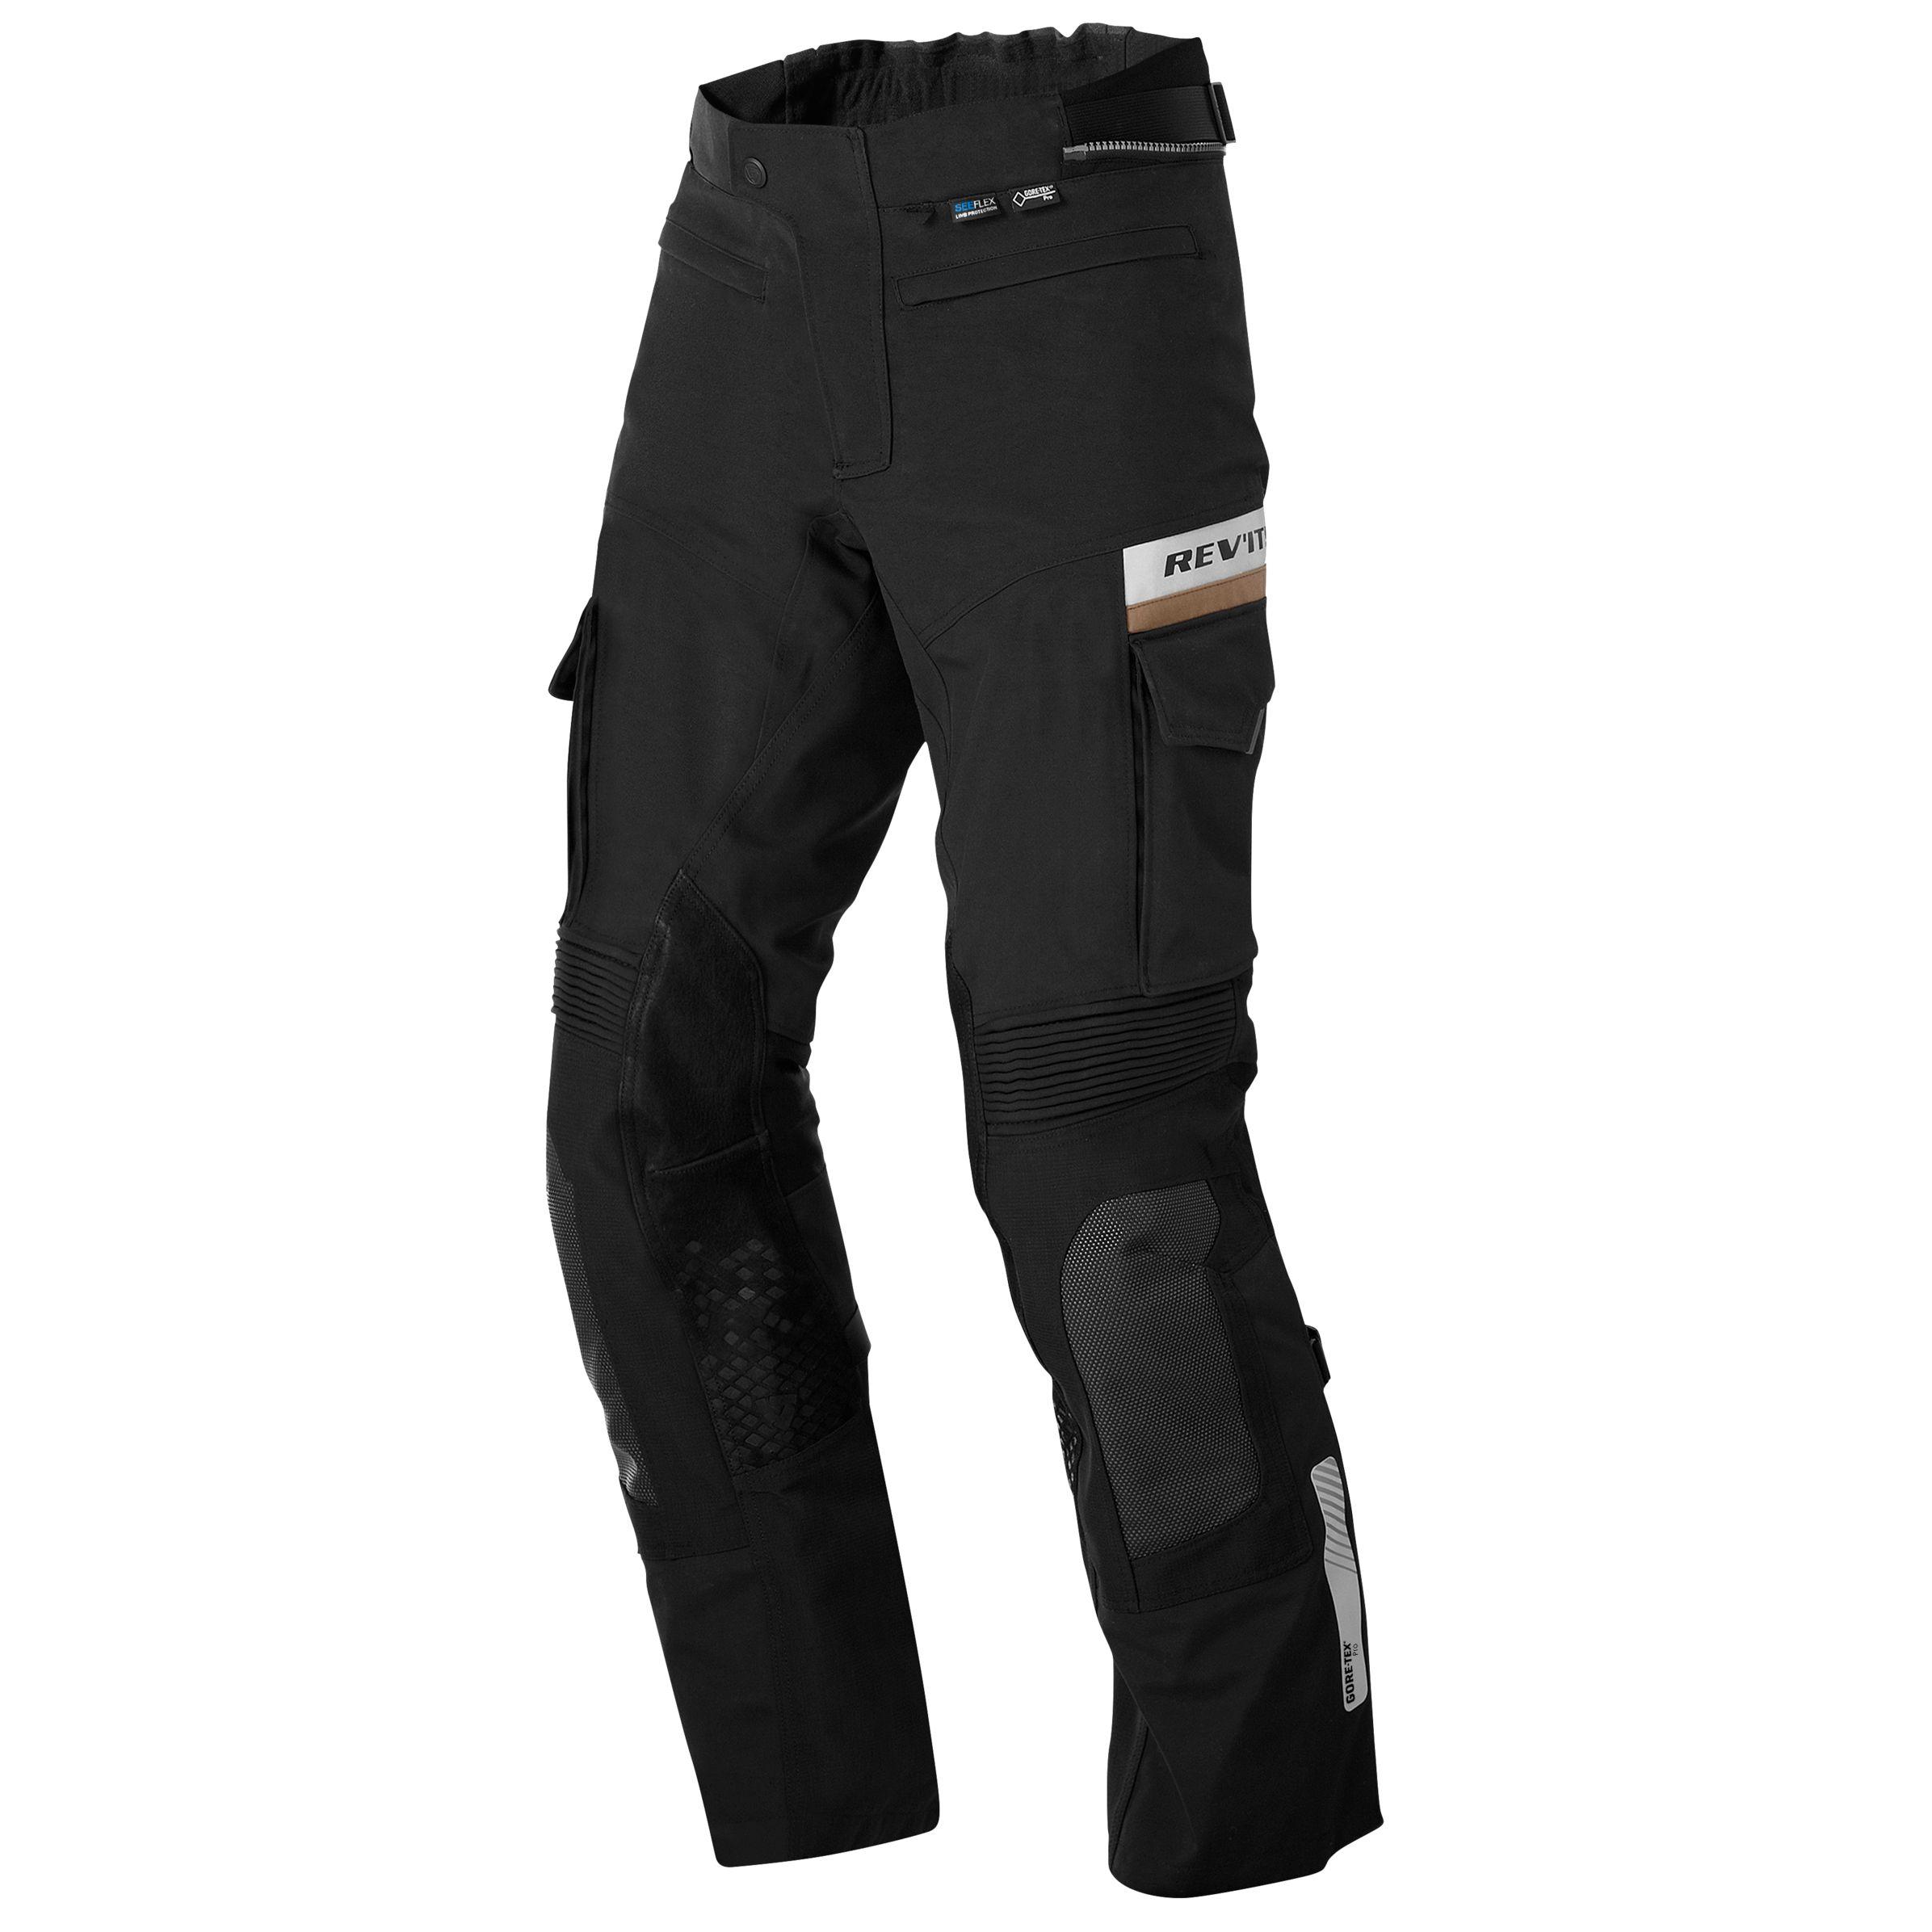 pantalon rev it dominator gore tex pantalon et combinaison. Black Bedroom Furniture Sets. Home Design Ideas